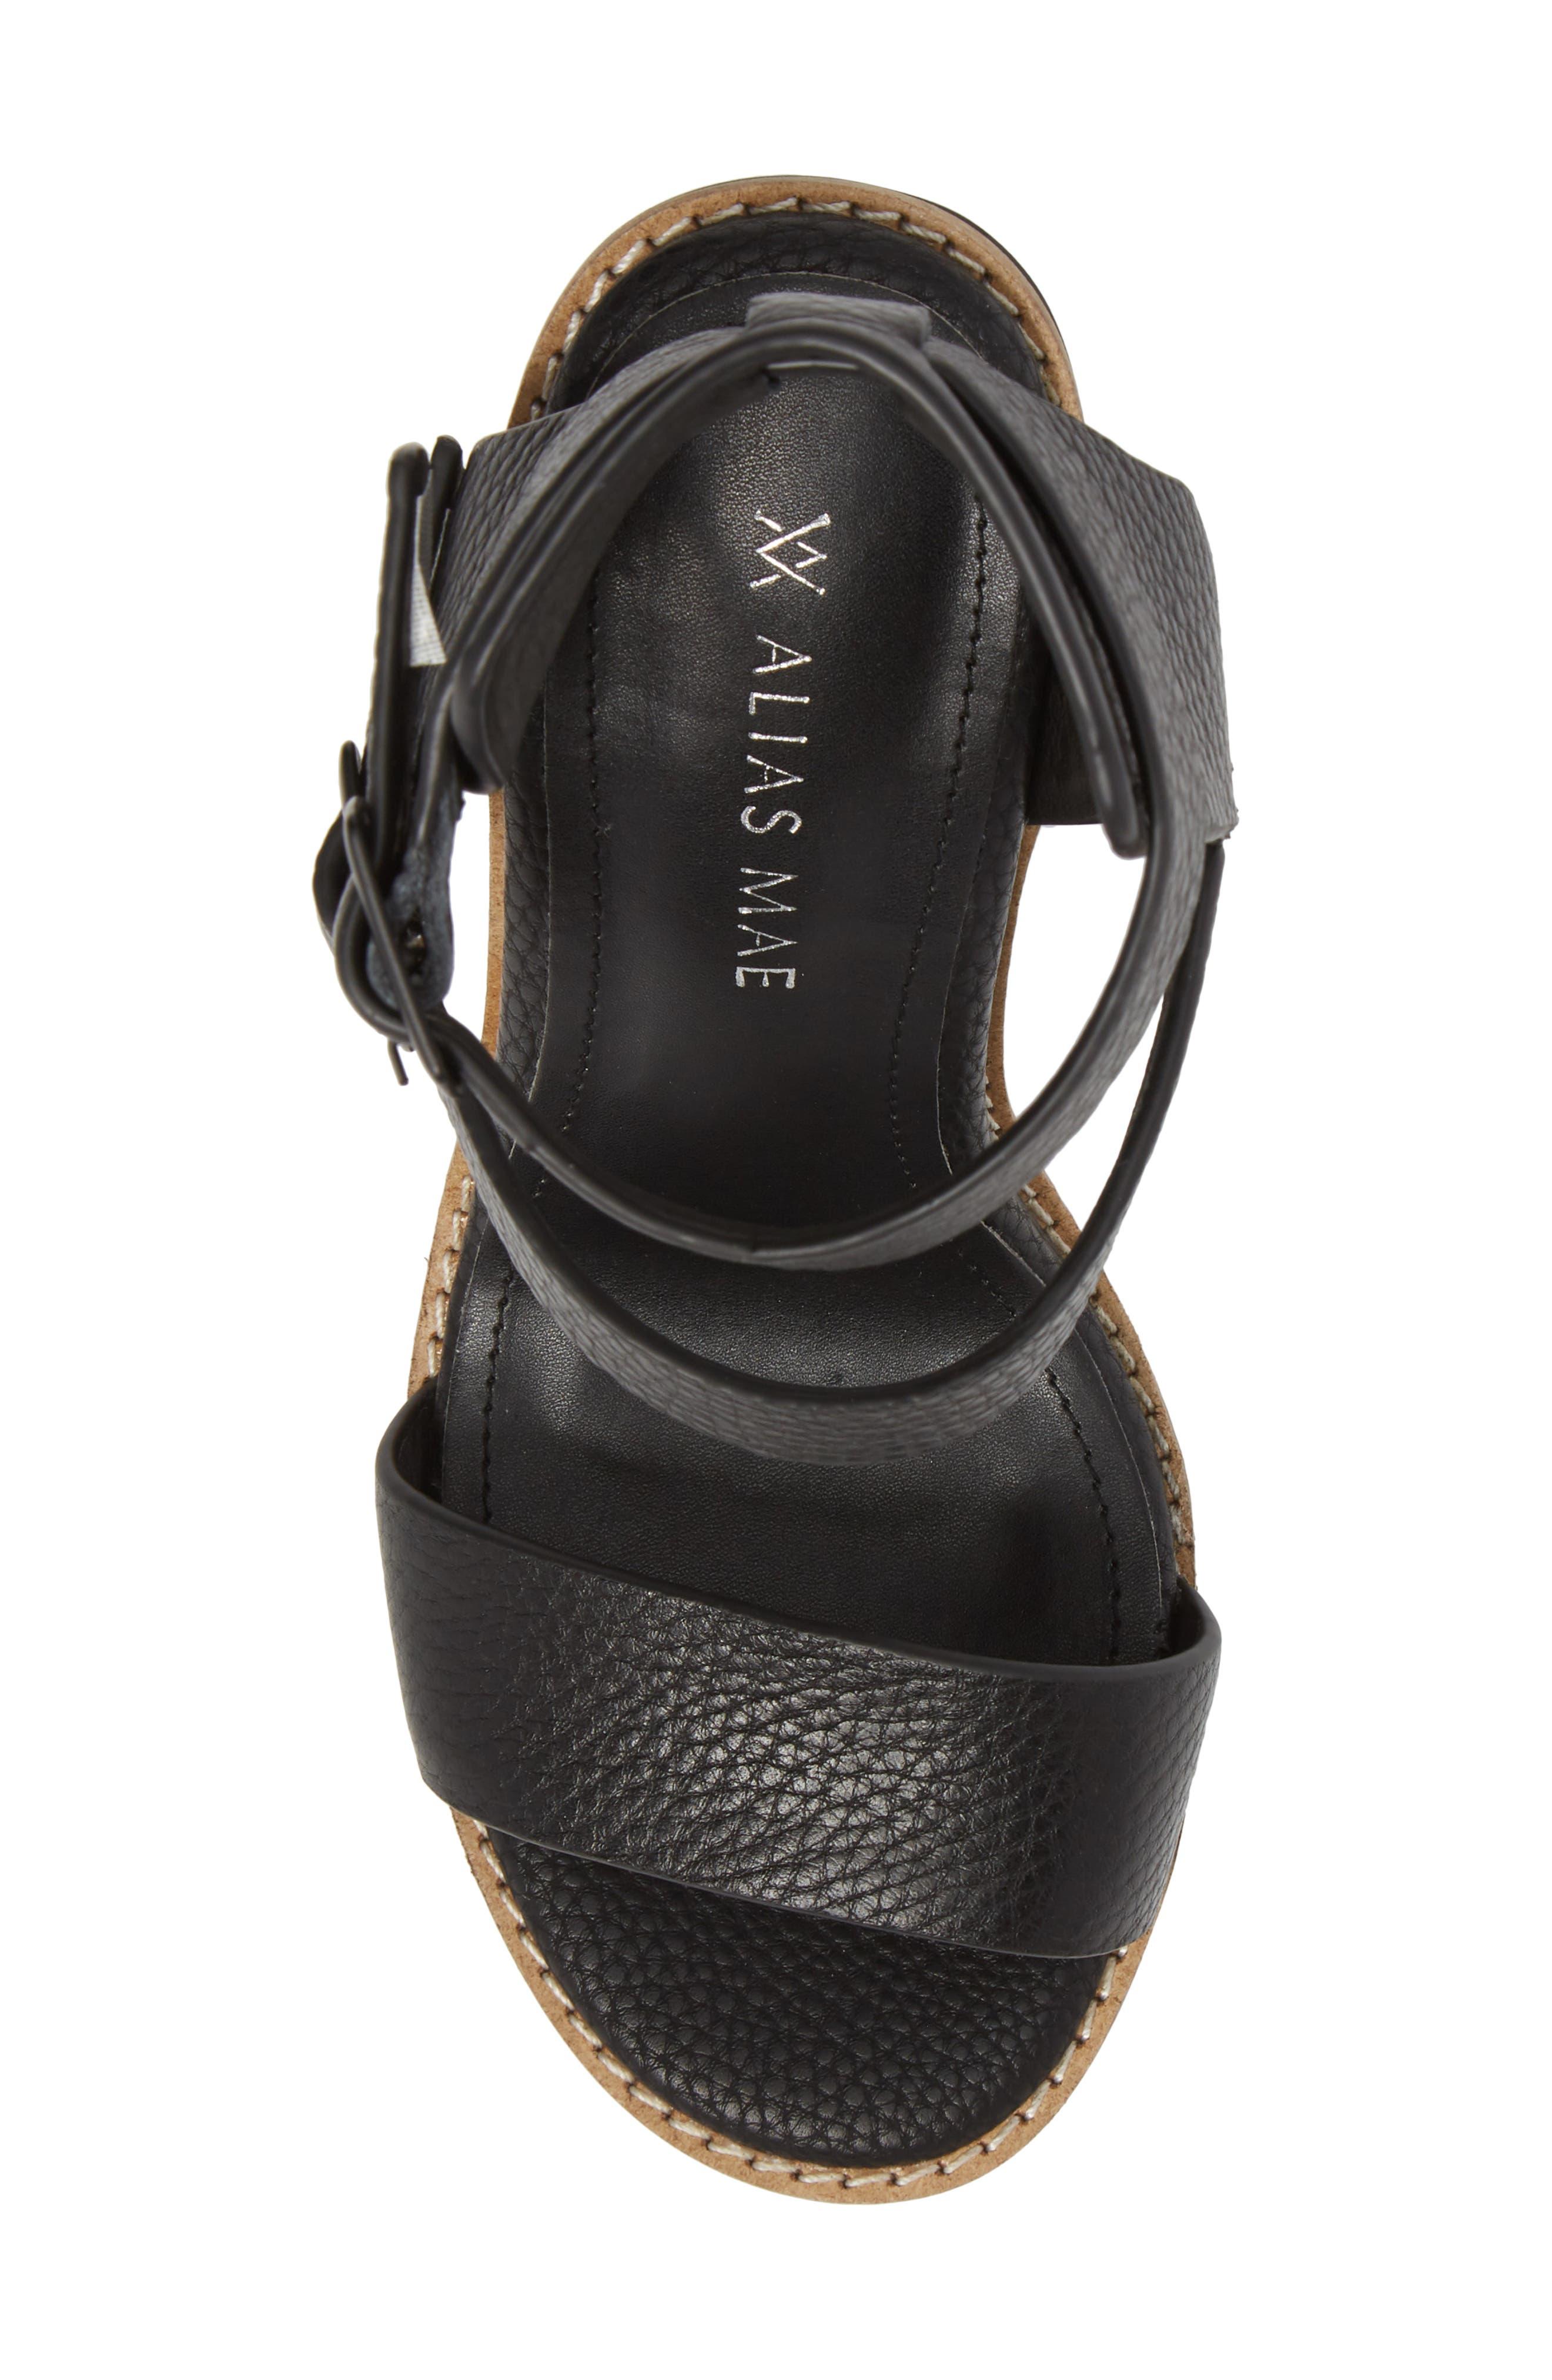 Casper Tall Sandal,                             Alternate thumbnail 5, color,                             Black Leather